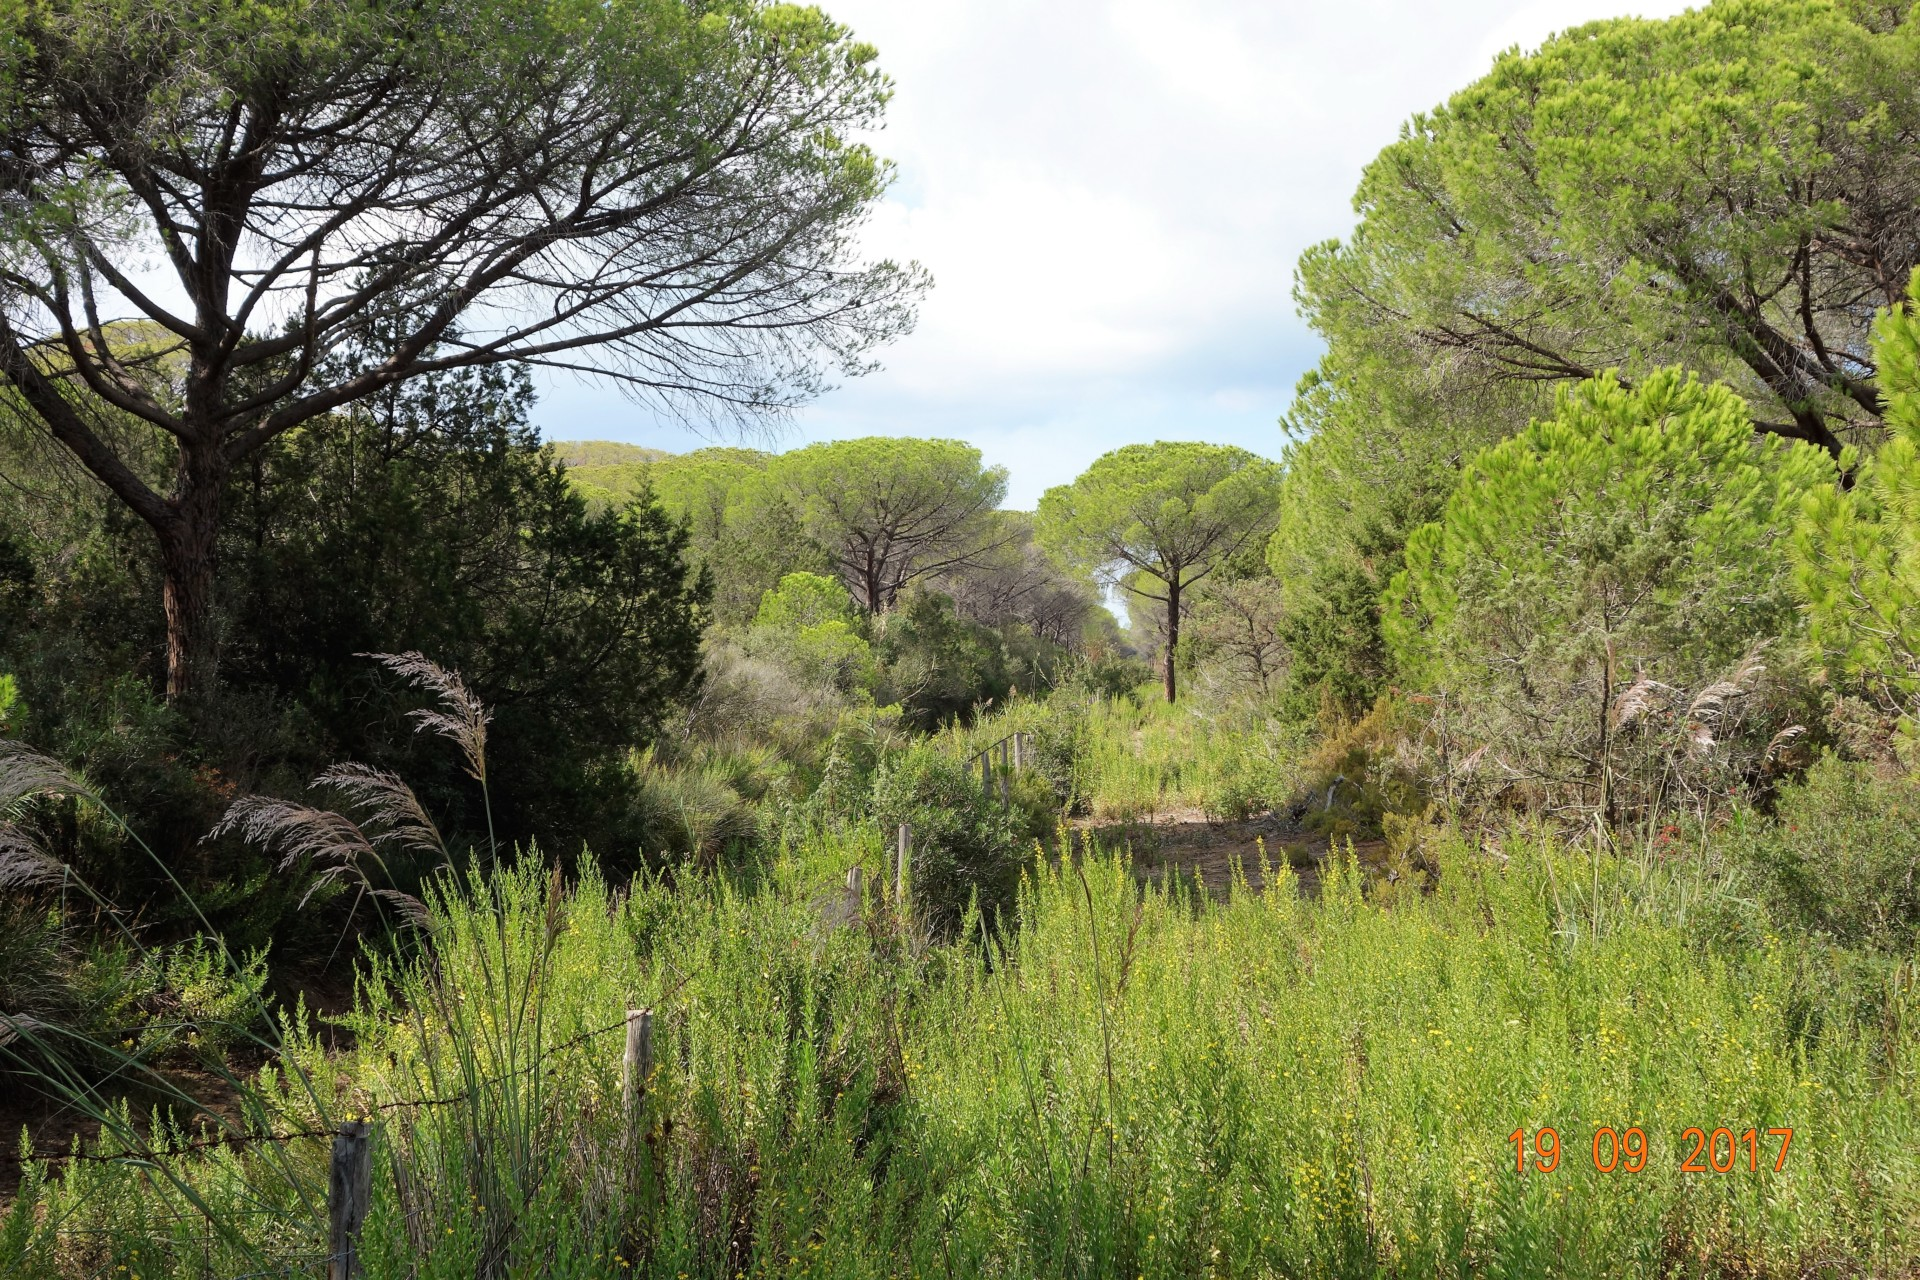 Alles grün entlang des Kanals, auch im trockenen Sommer 2017